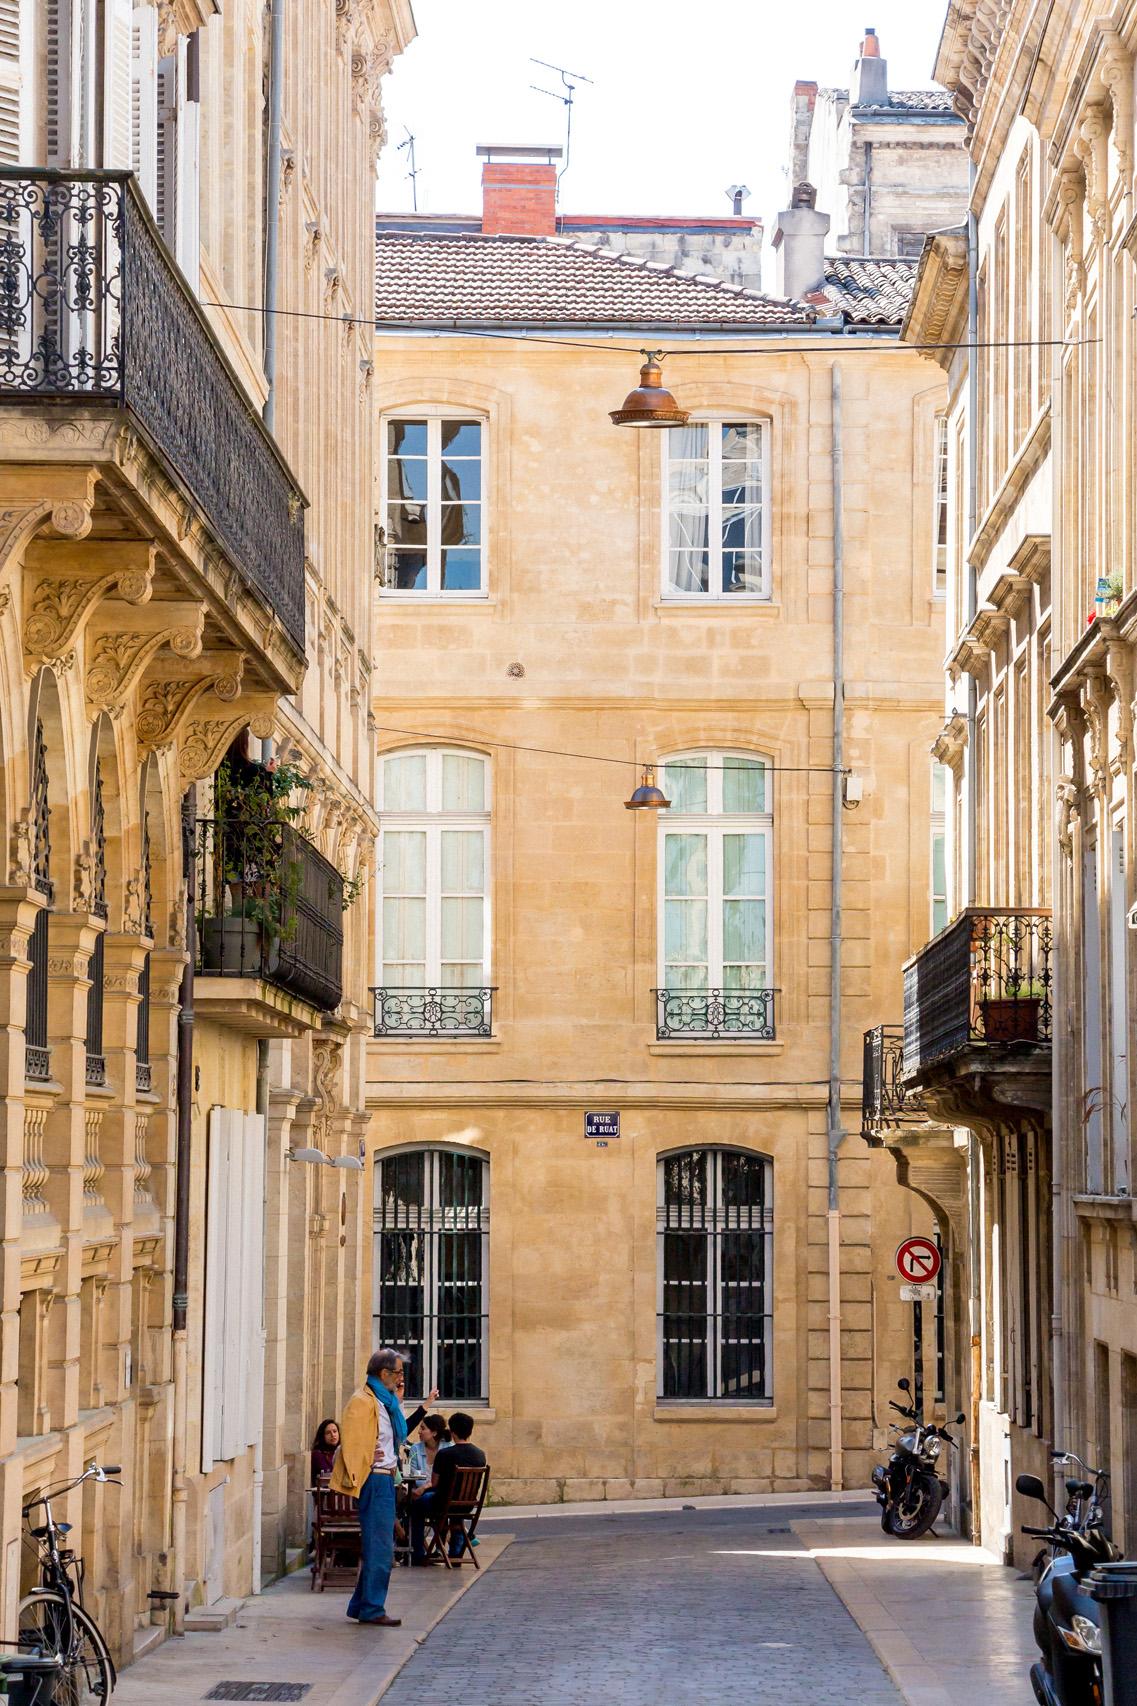 On the street, Bordeaux